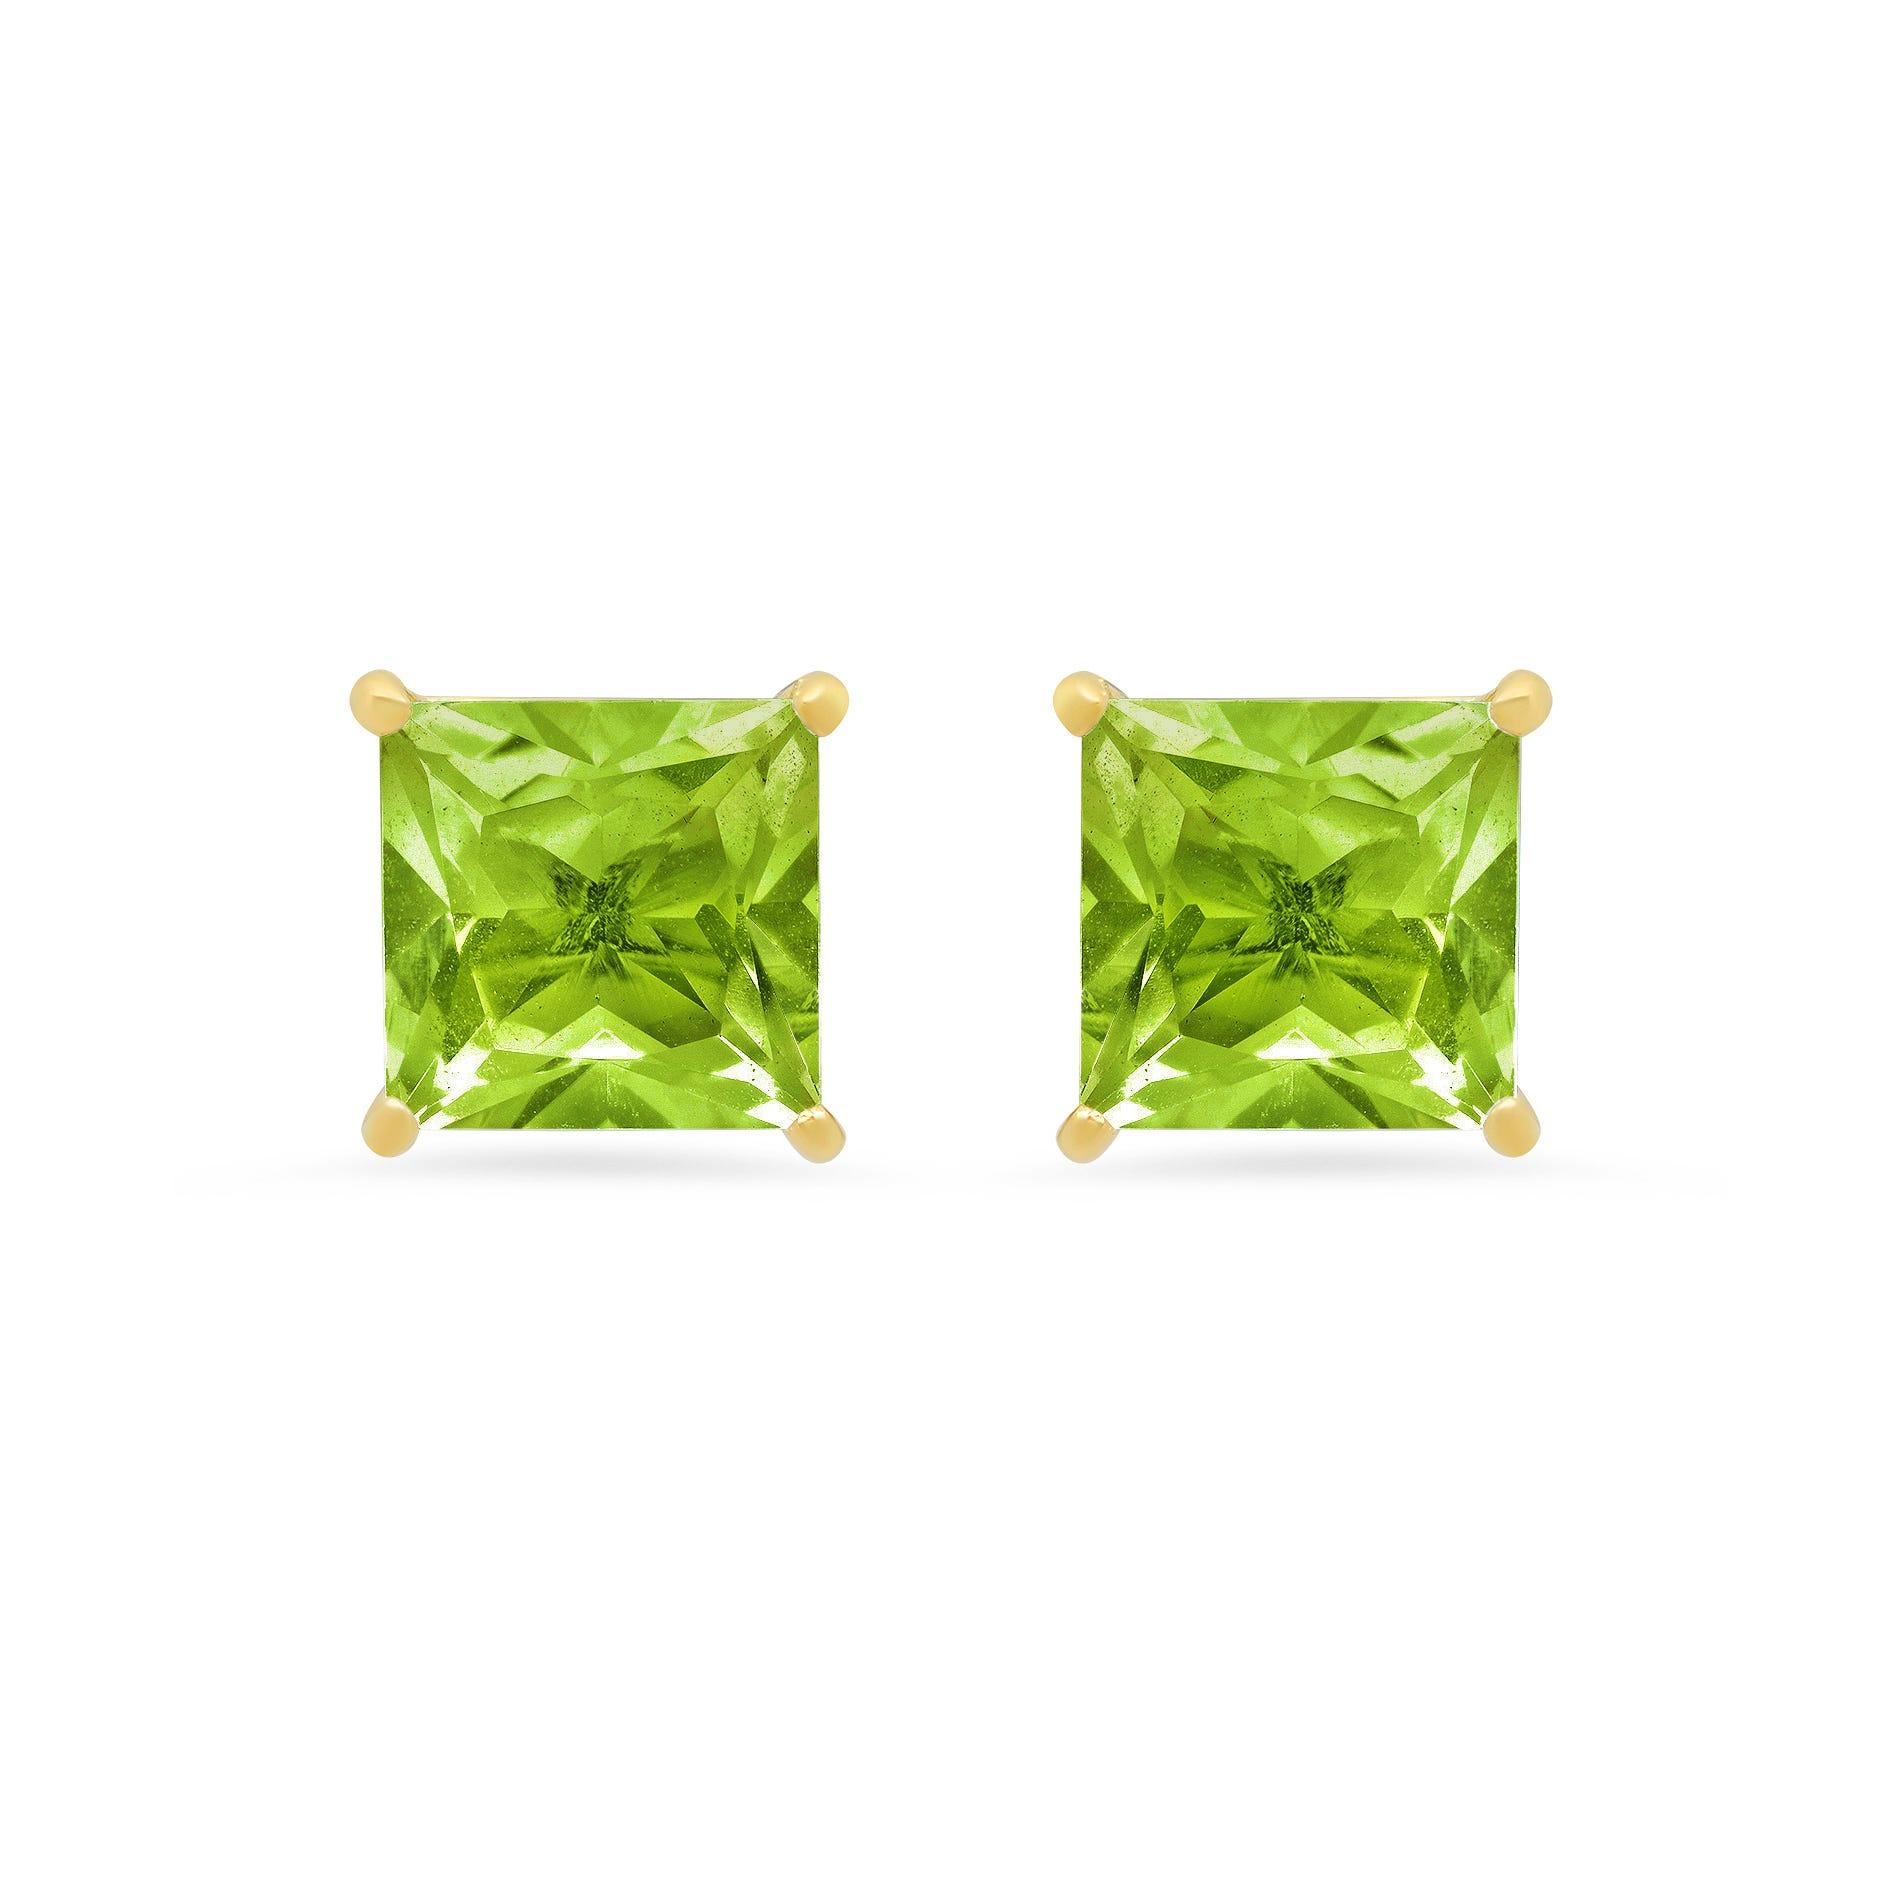 Princess-Cut Peridot Solitaire Stud Earrings in 14k Yellow Gold